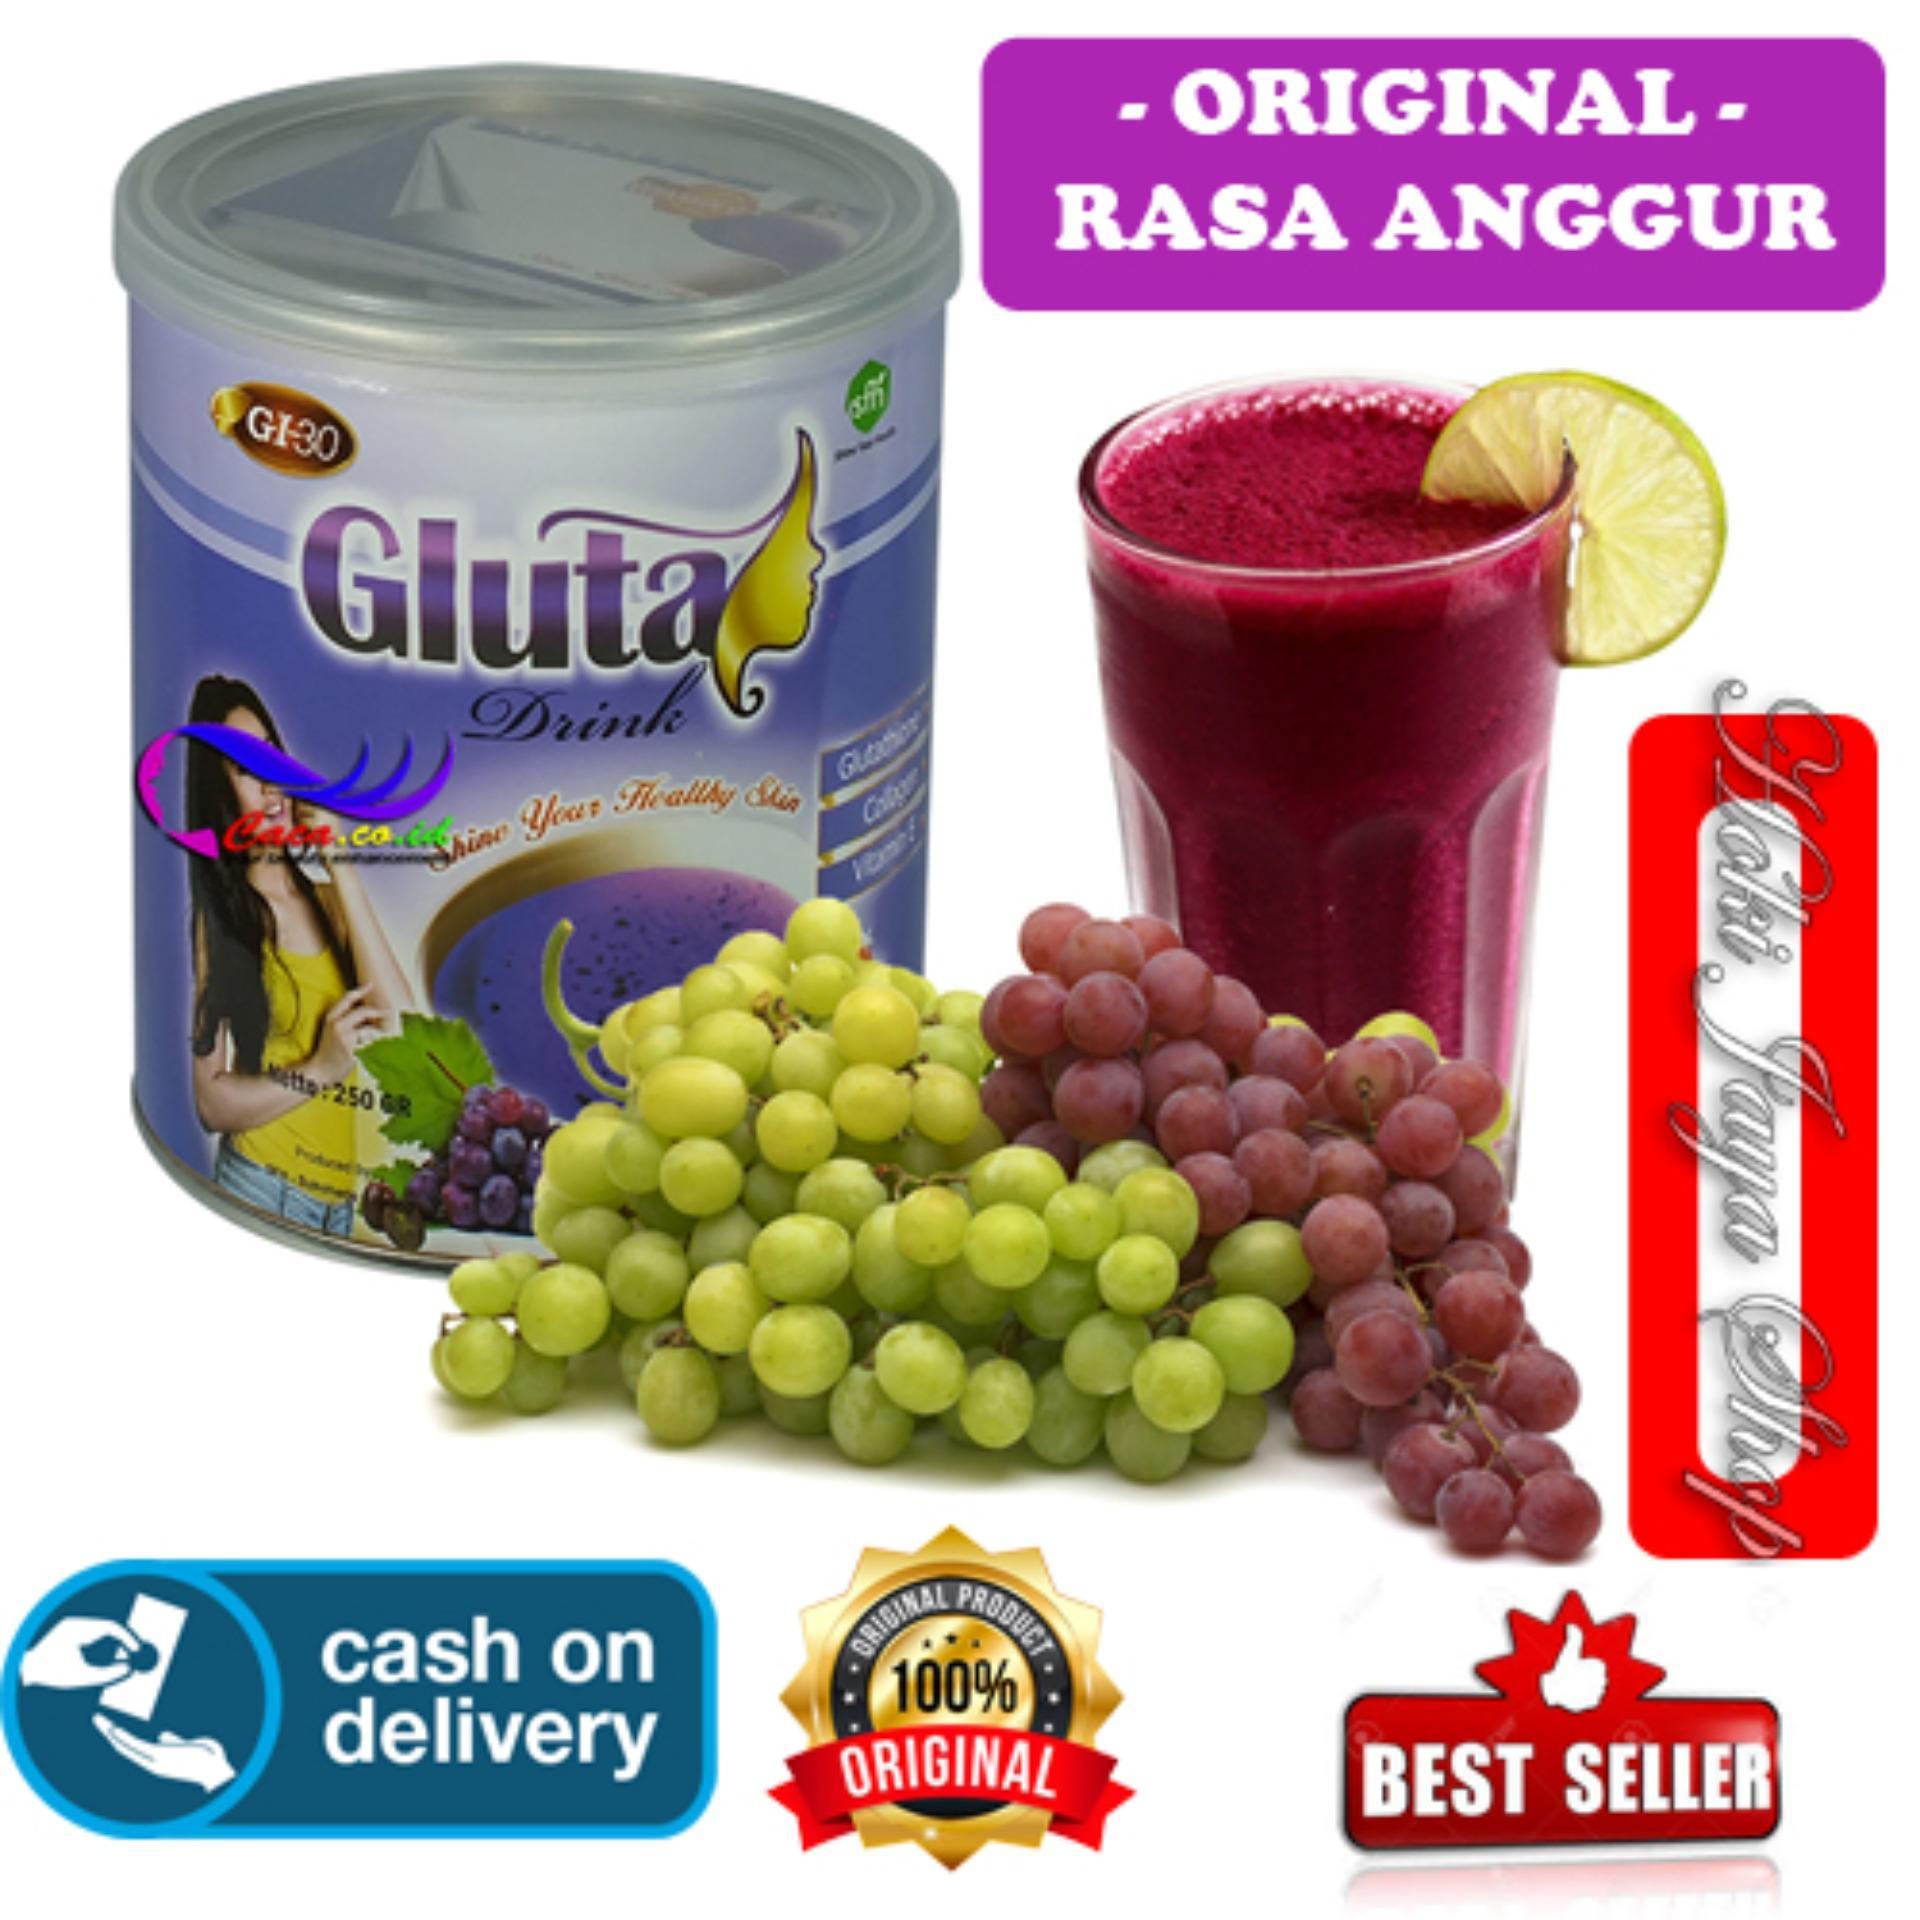 HOKI COD - Gluta Drink Original Anggur / Susu Gluta / Suplemen Kolagen / Suplemen Pemutih Kulit / Suplemen Pemutih Badan / Suplemen Antioksidan